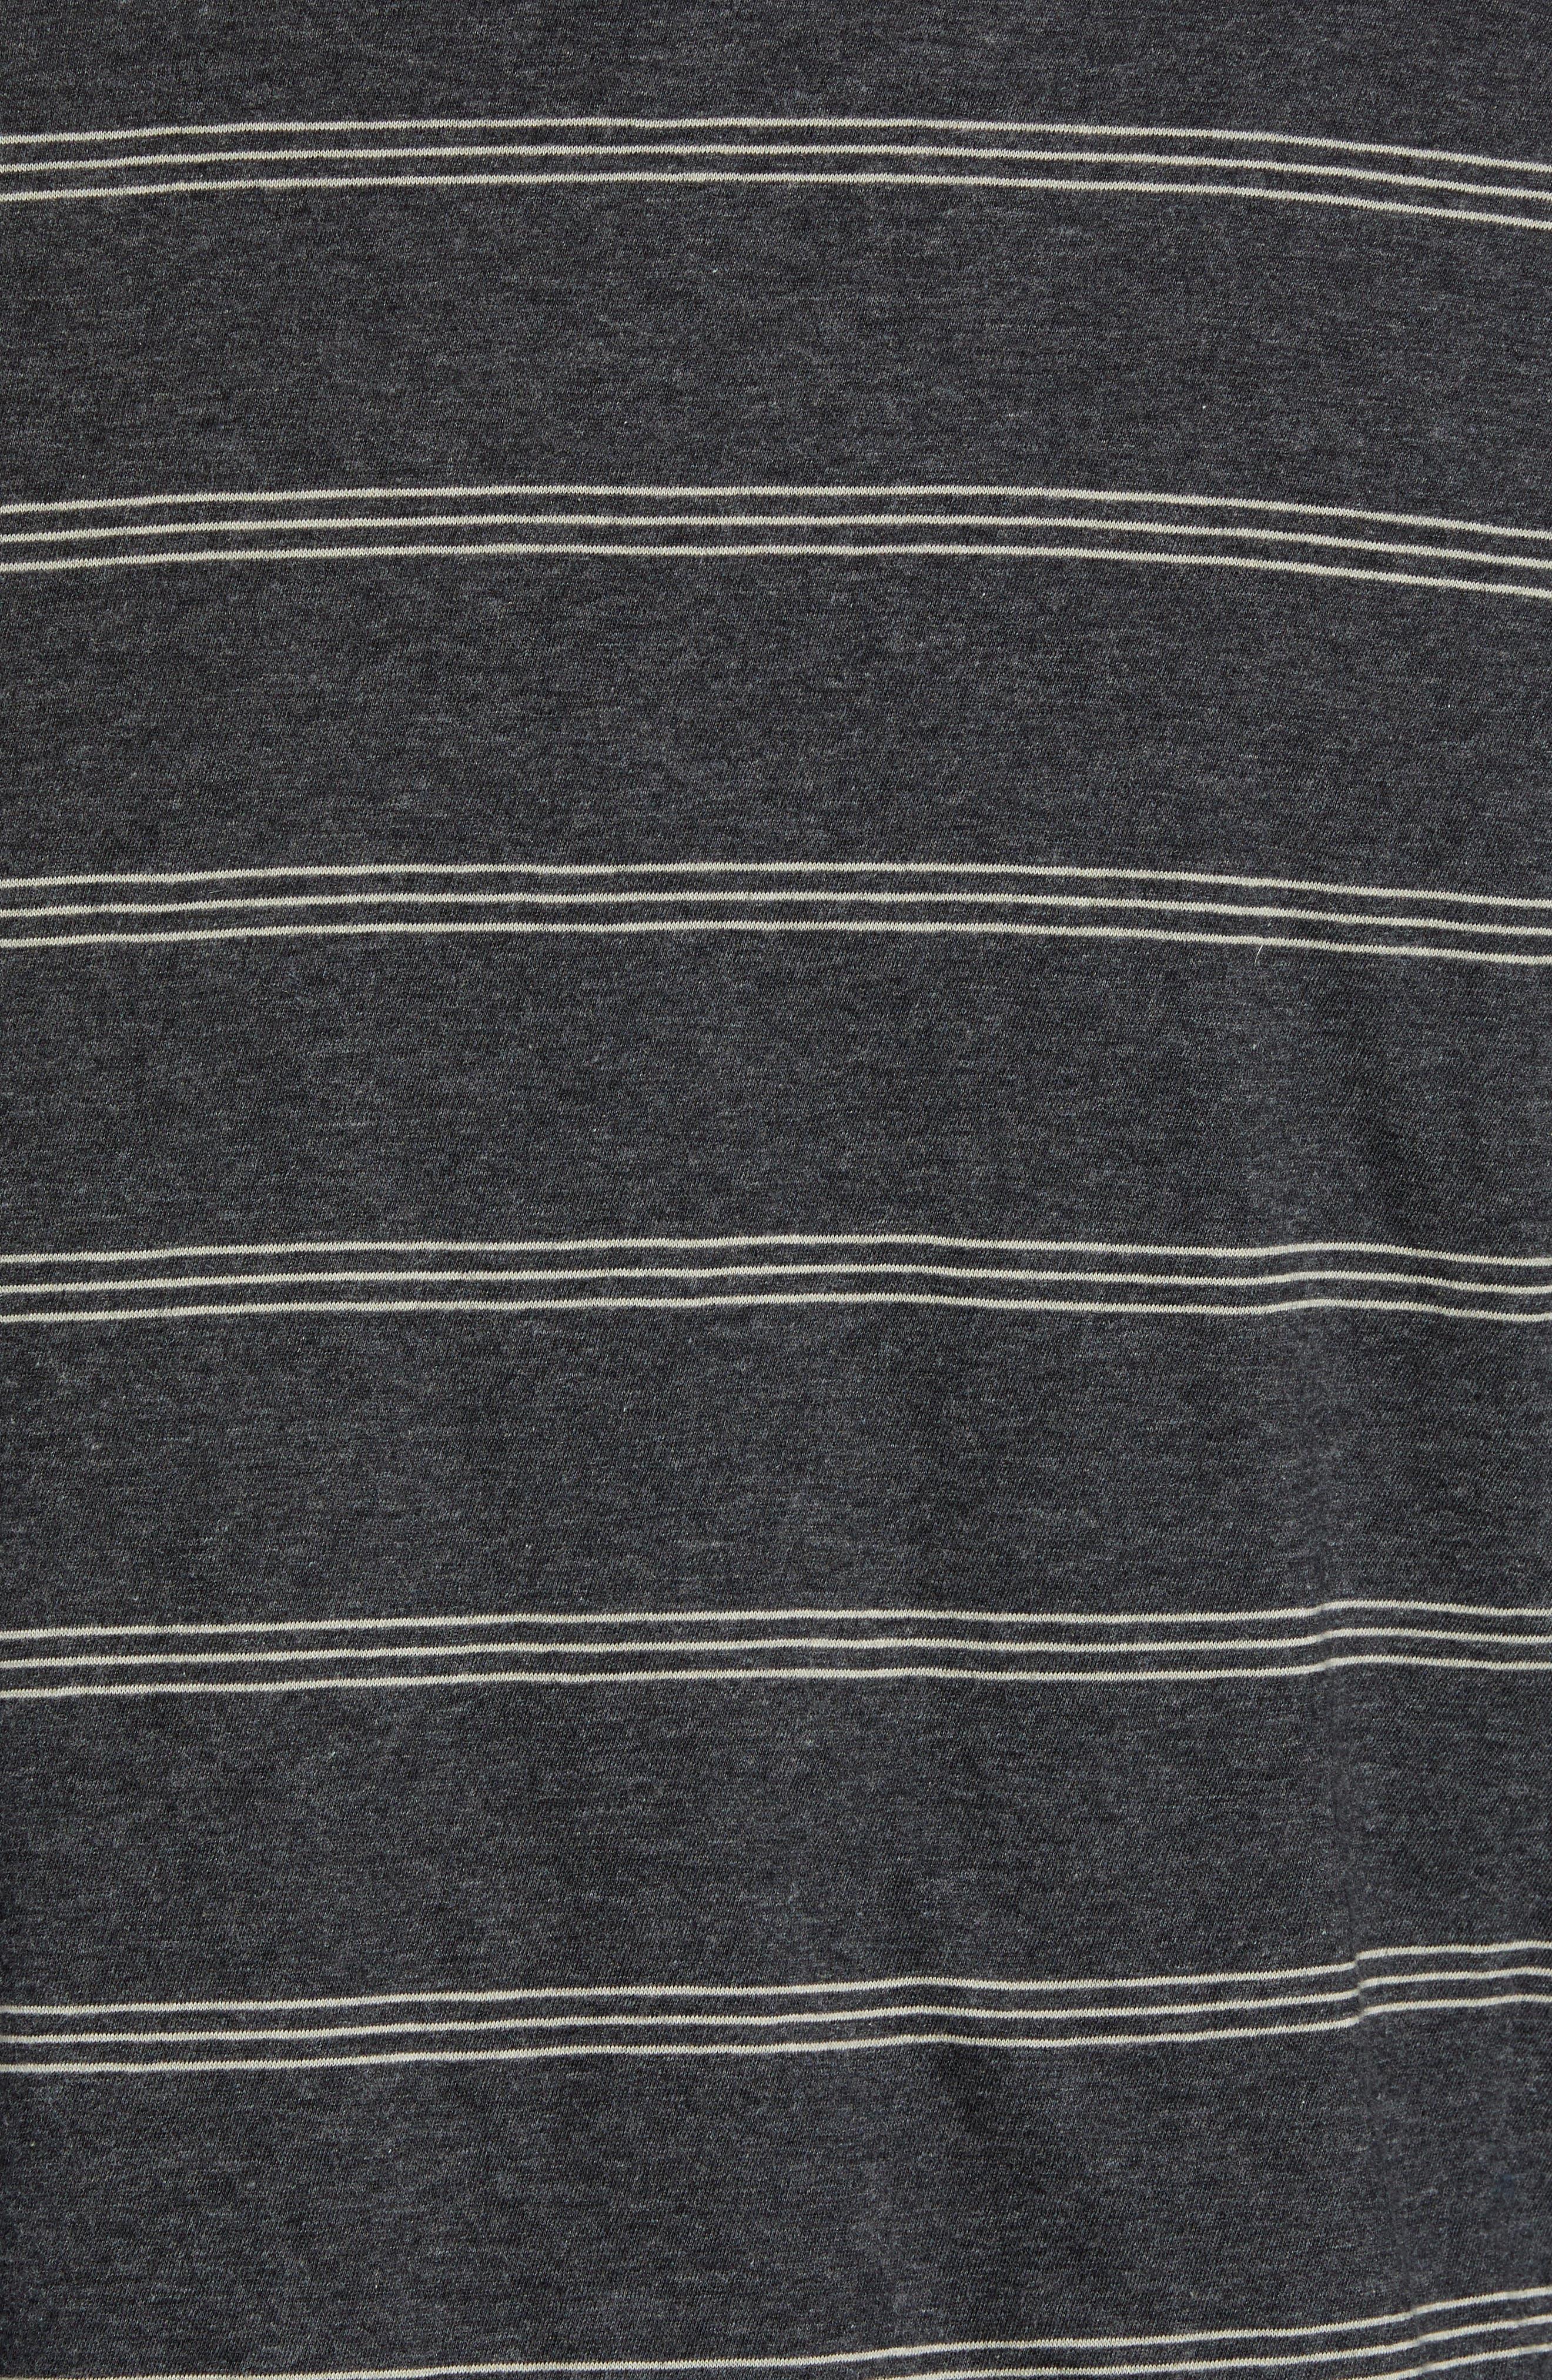 Gunnison Reversible Raglan Sleeve T-Shirt,                             Alternate thumbnail 6, color,                             PHANTOM HEATHER